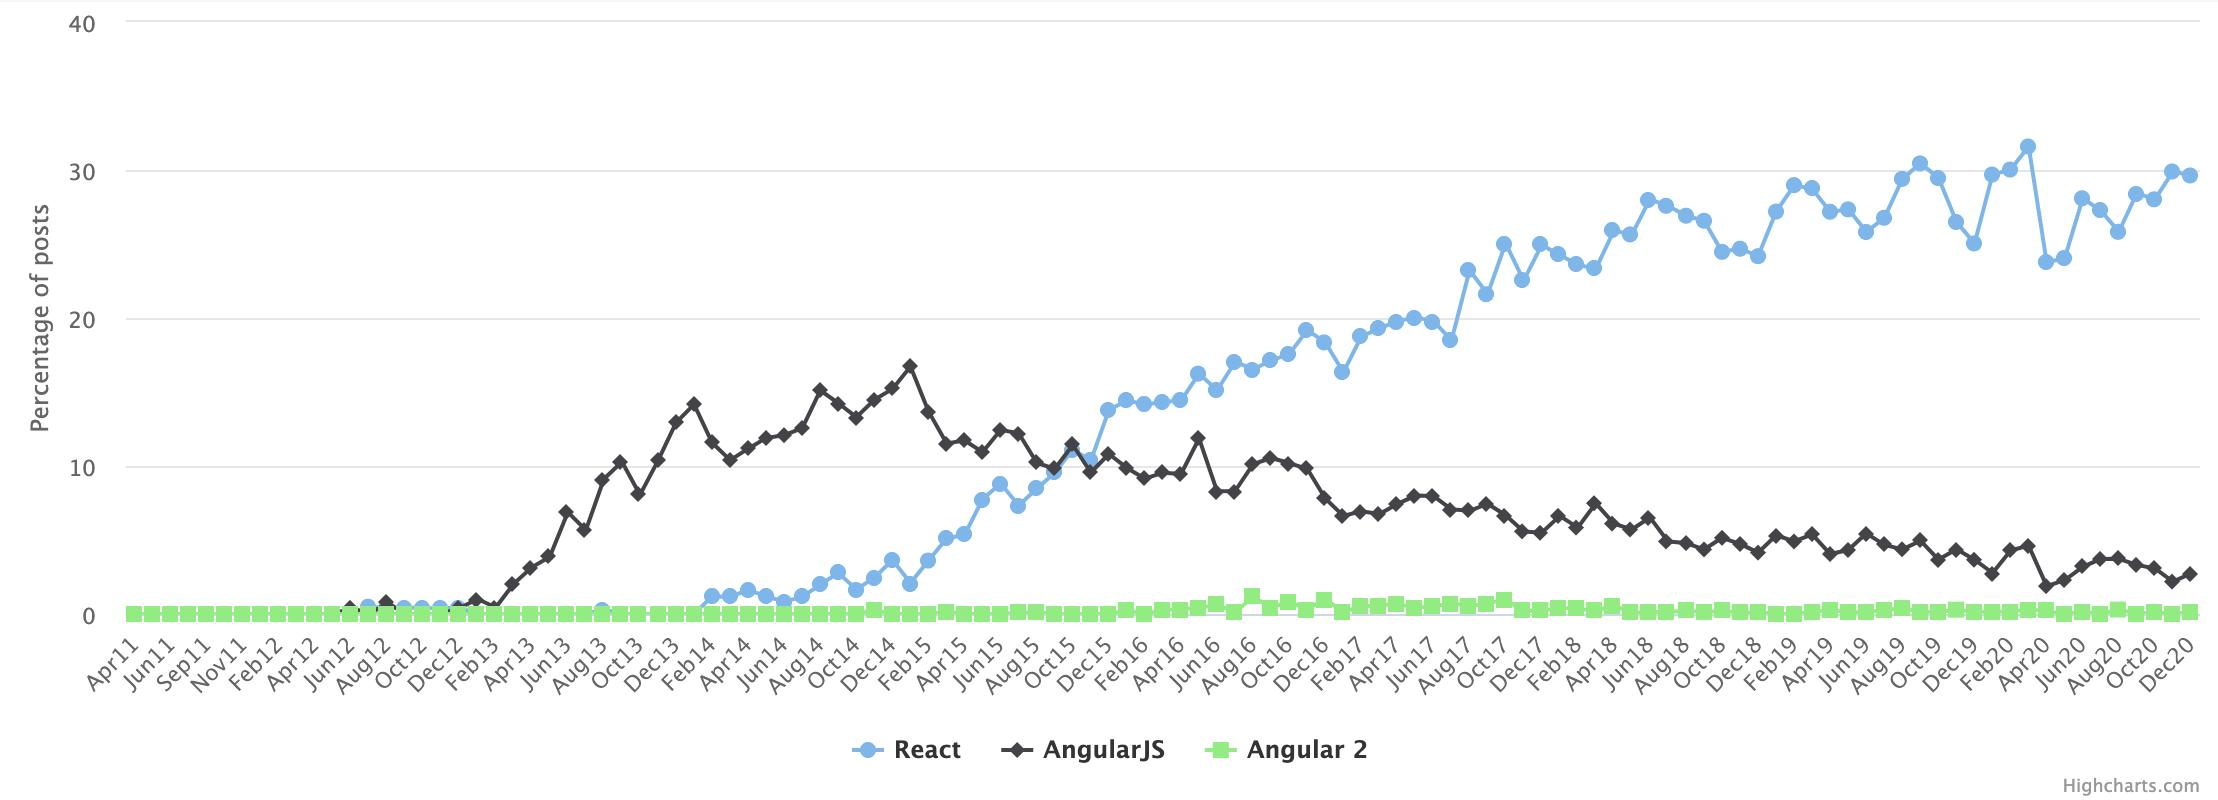 A job market comparison of Angular vs React